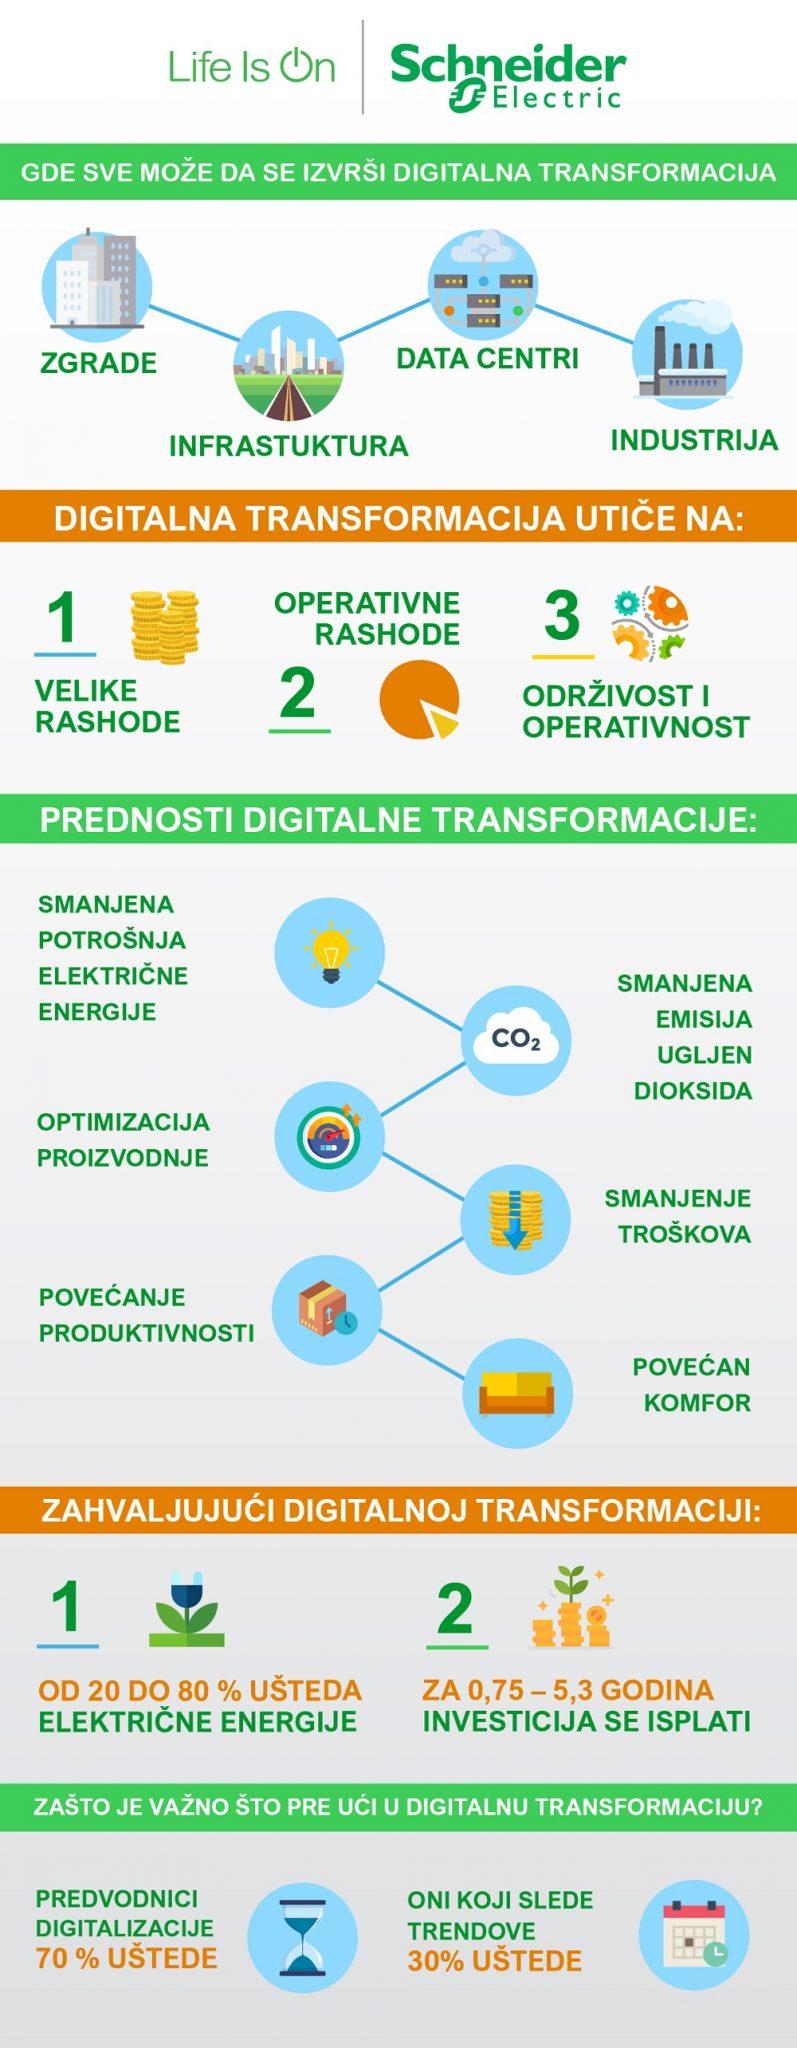 Kompanija Schneider Electric predstavila prednosti digitalne transformacije